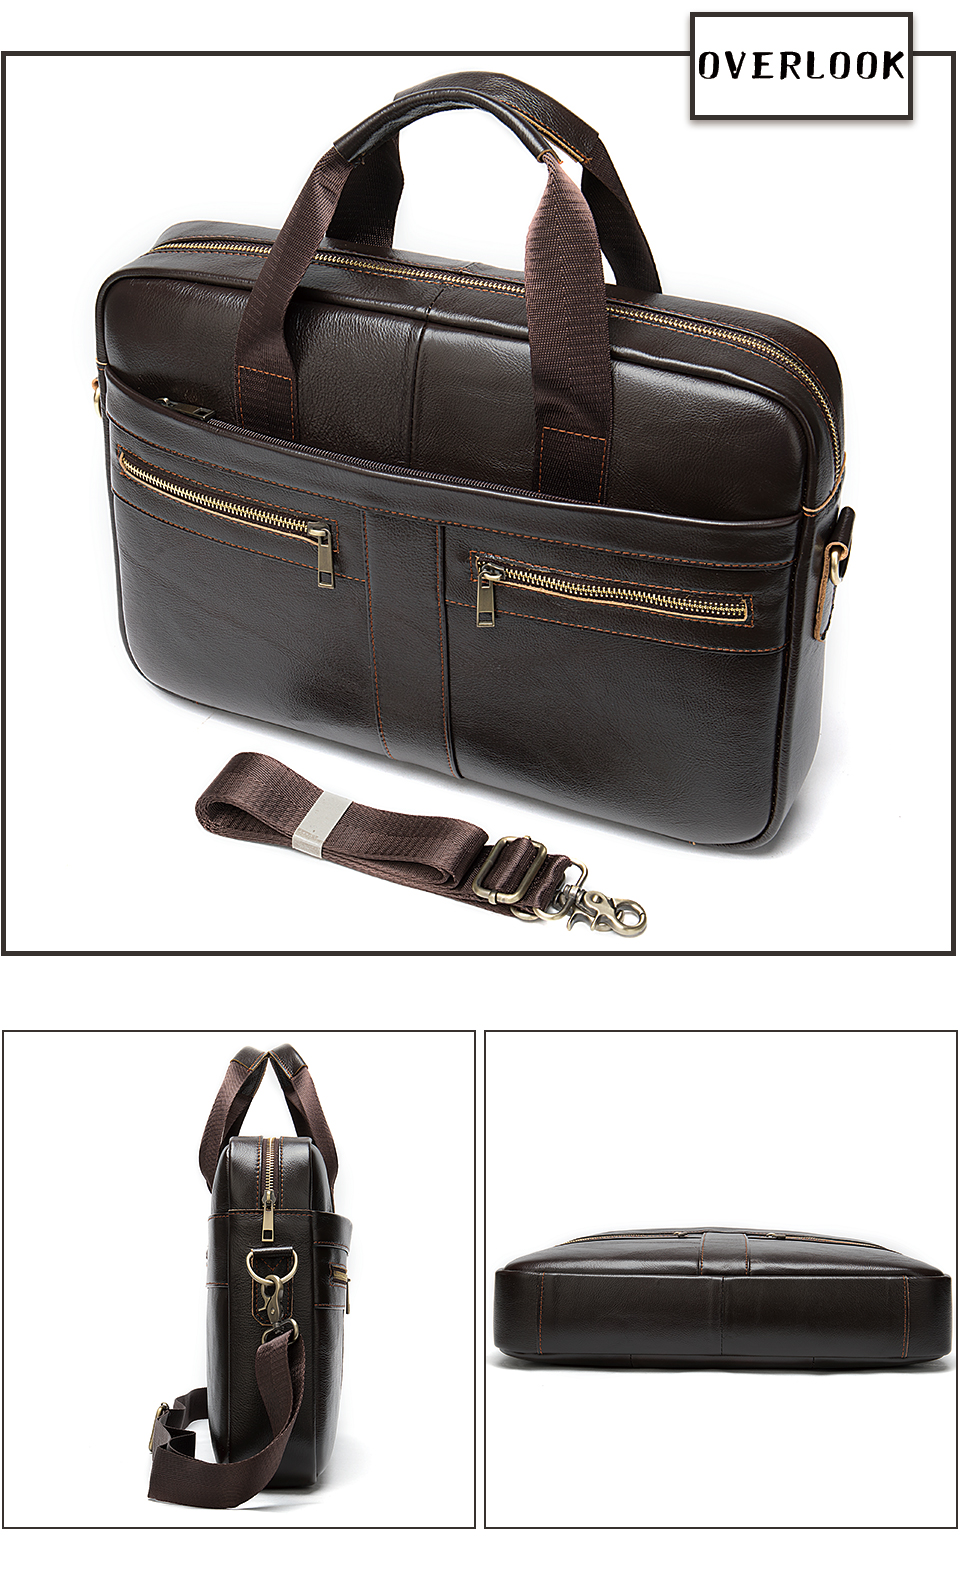 Hc58895555d3b41b08fdf4519ad2f1b90X WESTAL Bag men's Genuine Leather briefcase Male man laptop bag natural Leather for men Messenger bags men's briefcases 2019